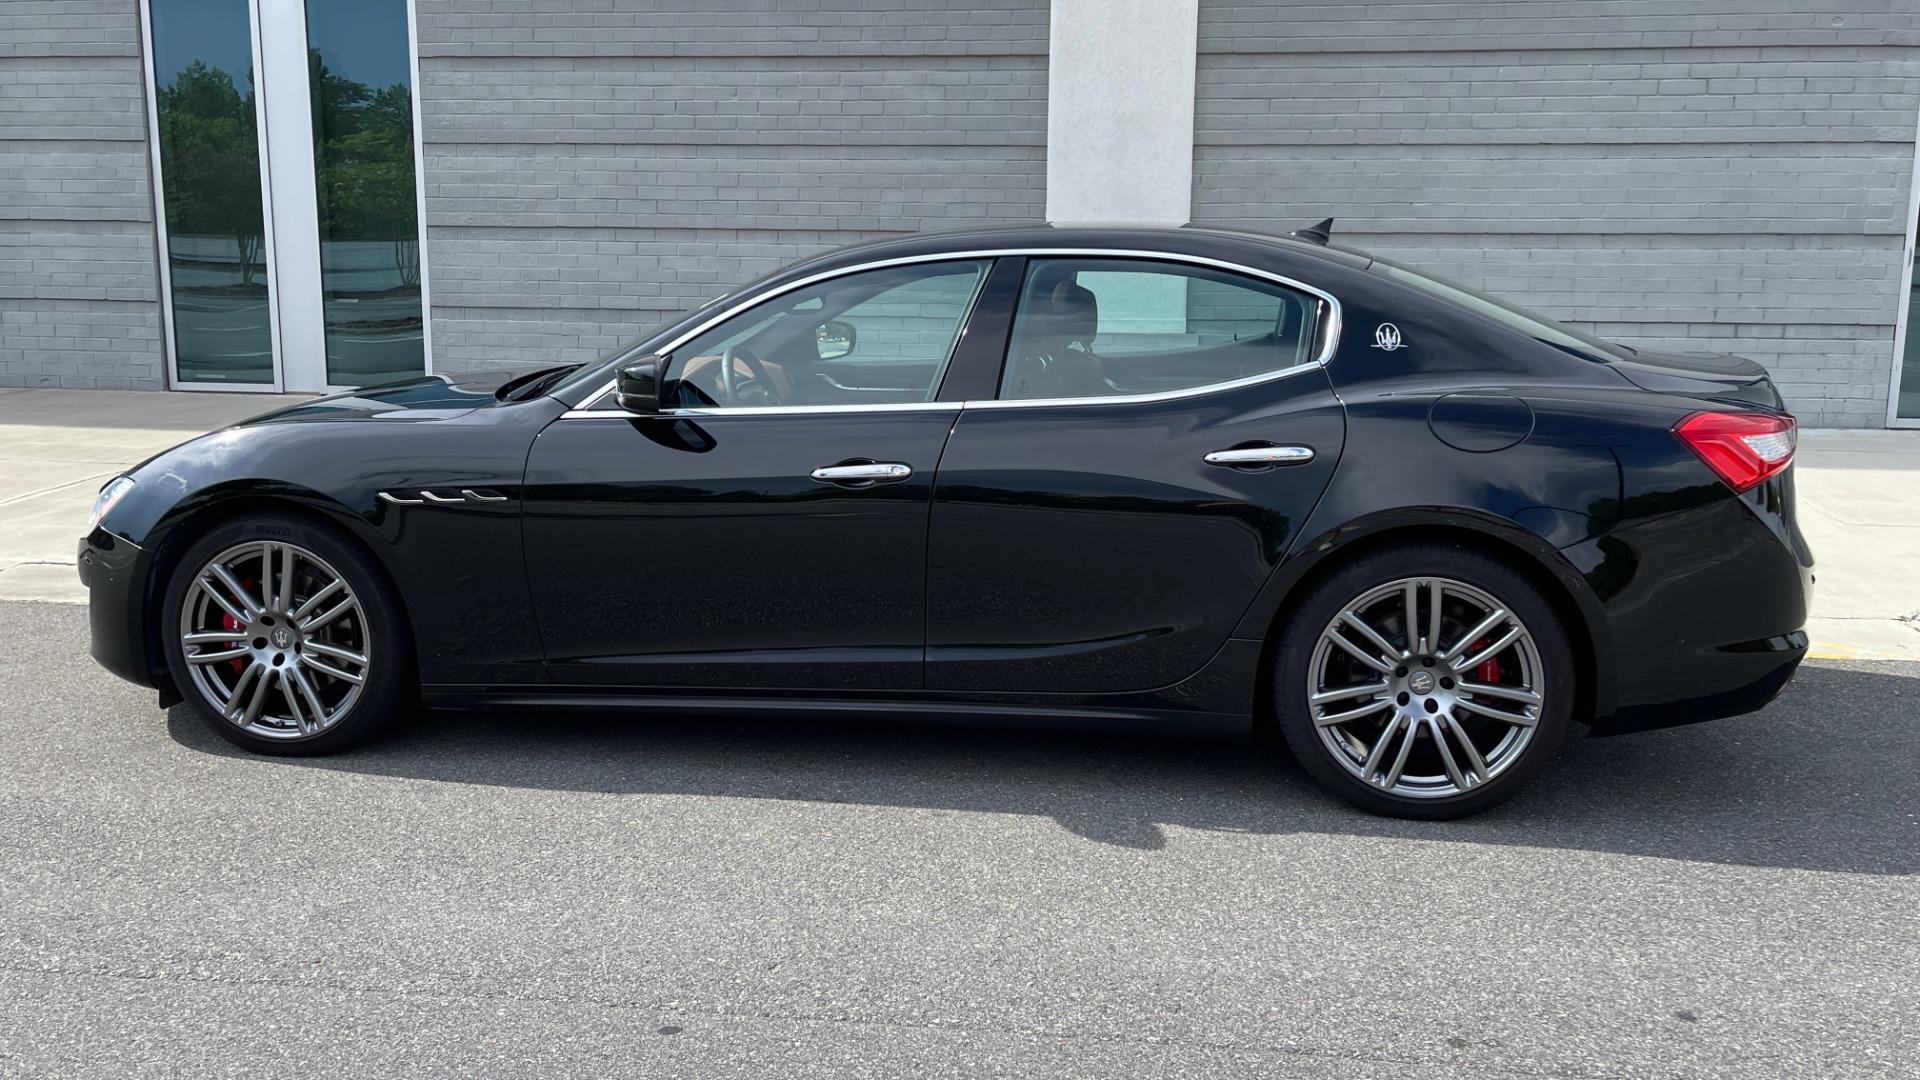 Used 2018 Maserati GHIBLI 3.0L SEDAN / 8-SPD AUTO / NAV / SUNROOF / REARVIEW for sale $42,995 at Formula Imports in Charlotte NC 28227 7